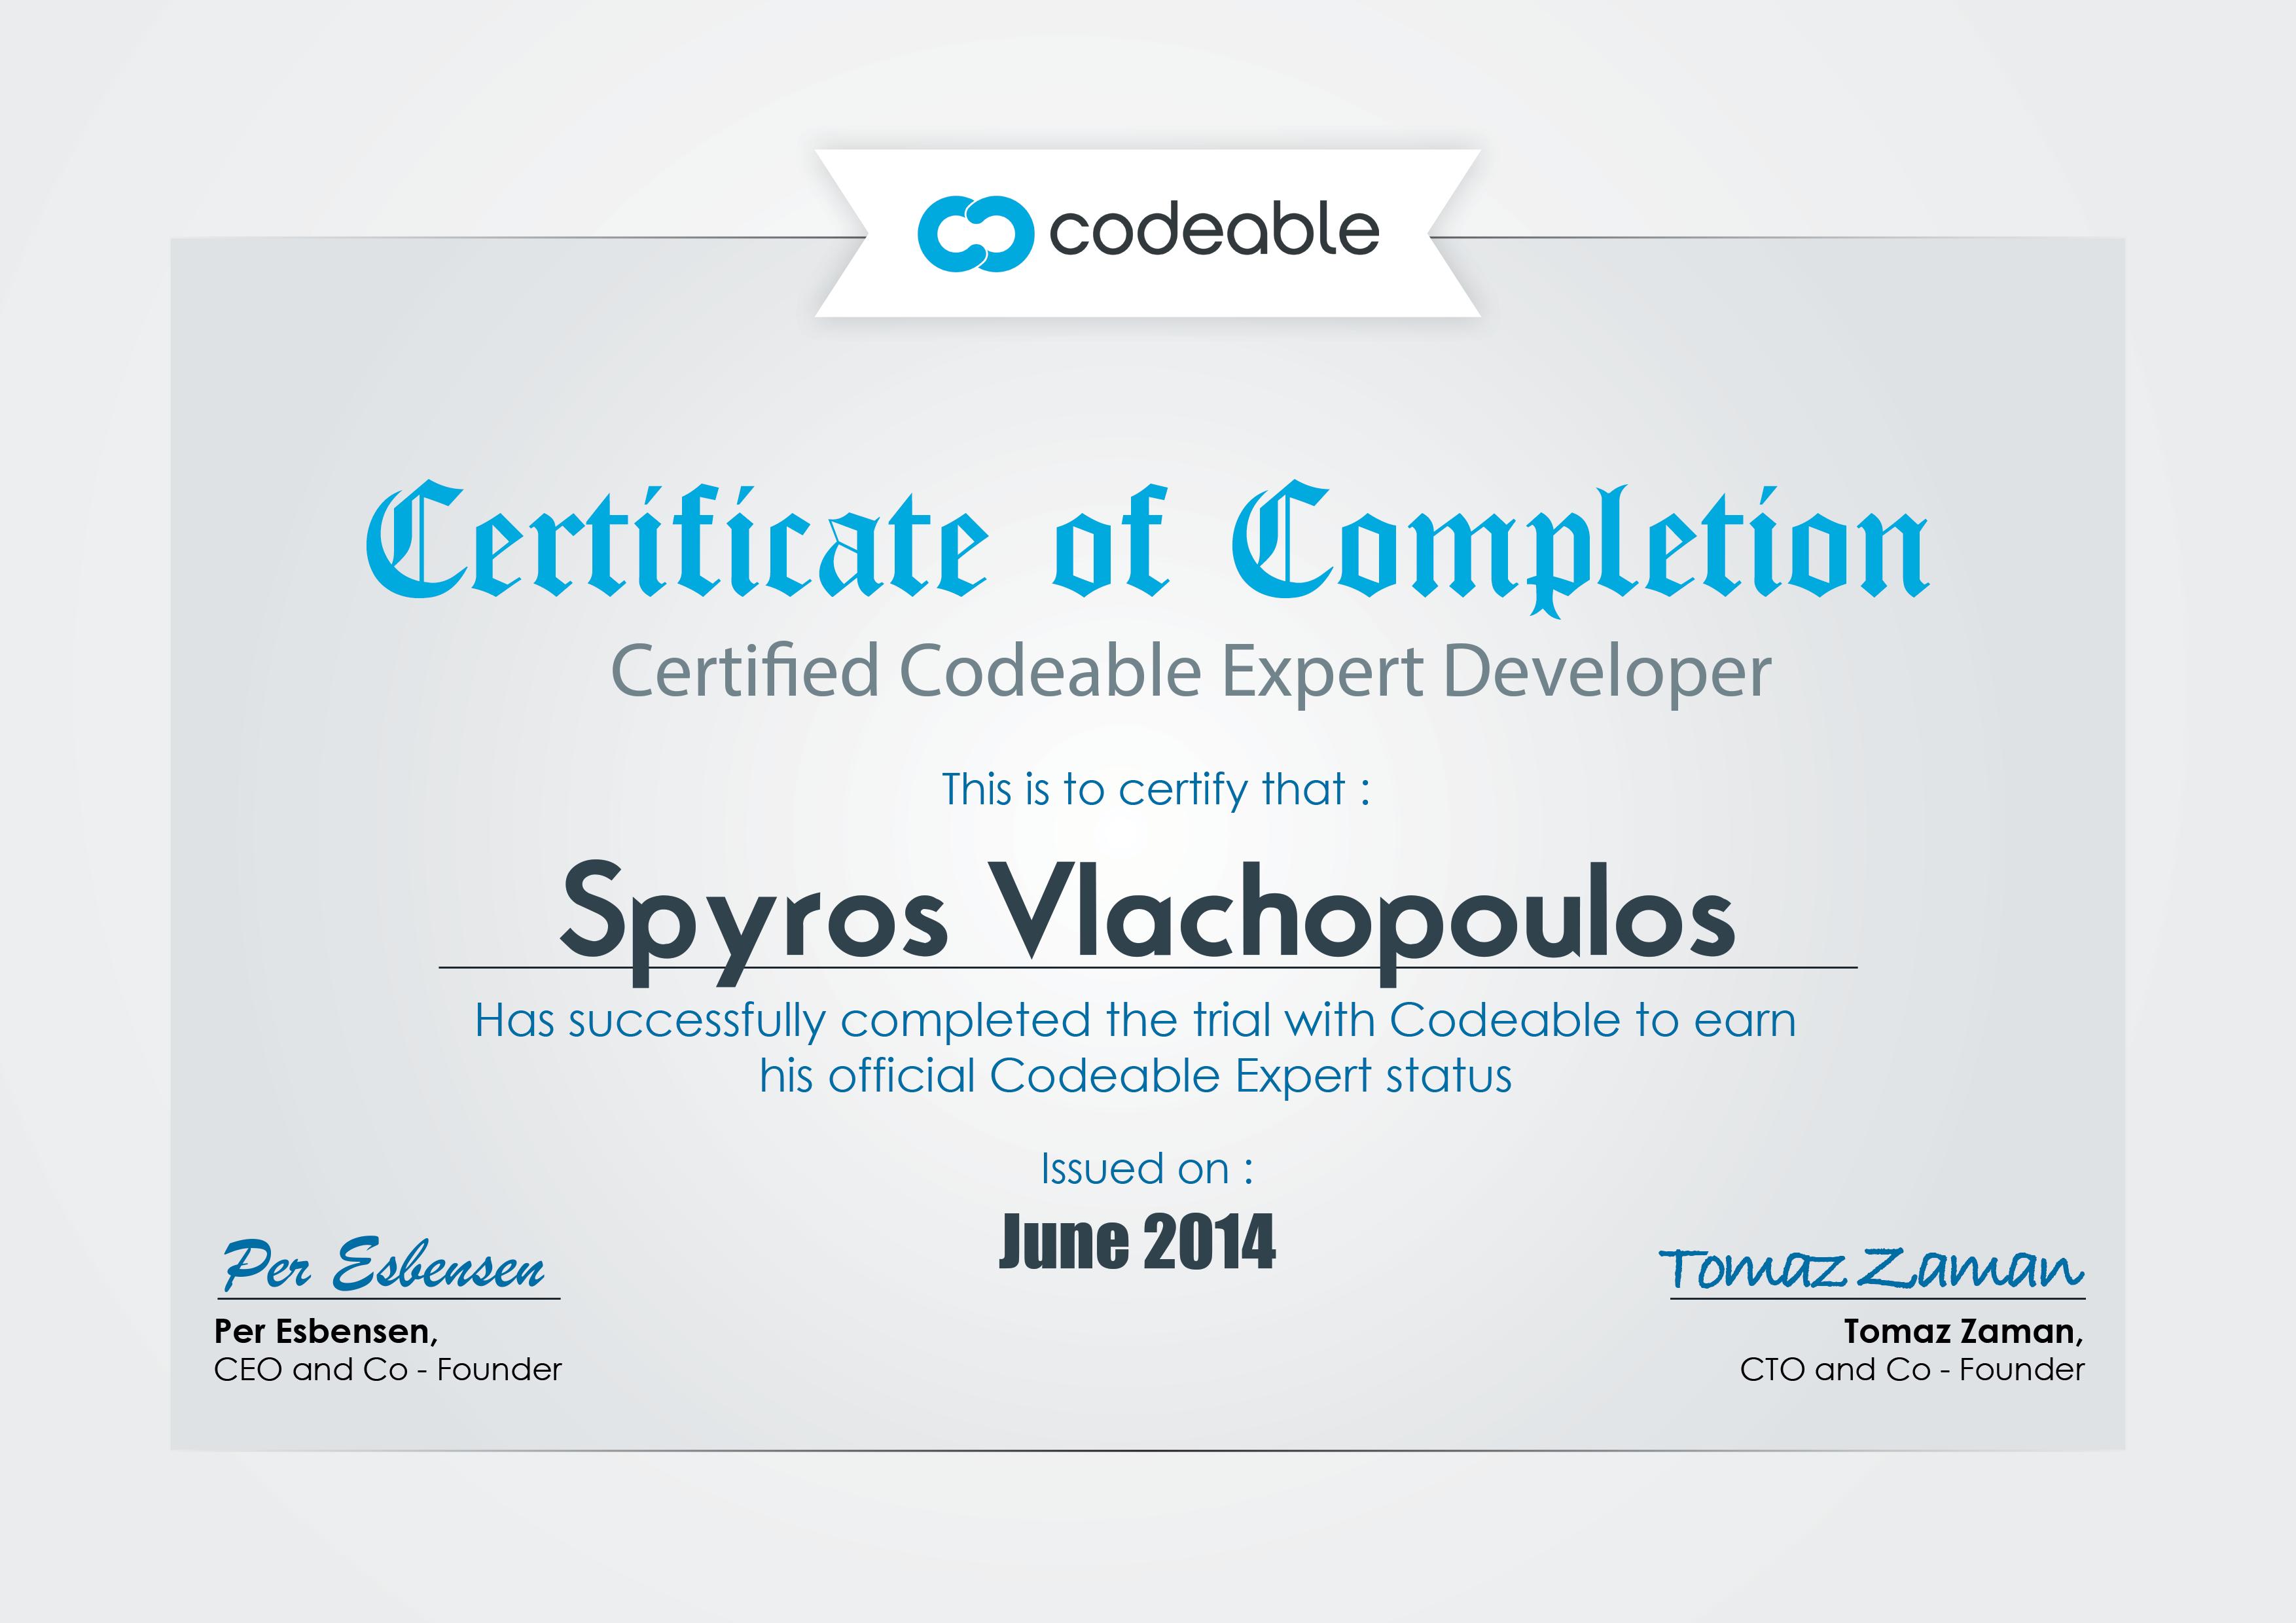 Spyros Vlachopoulos, Certified Codeable Expert Developer